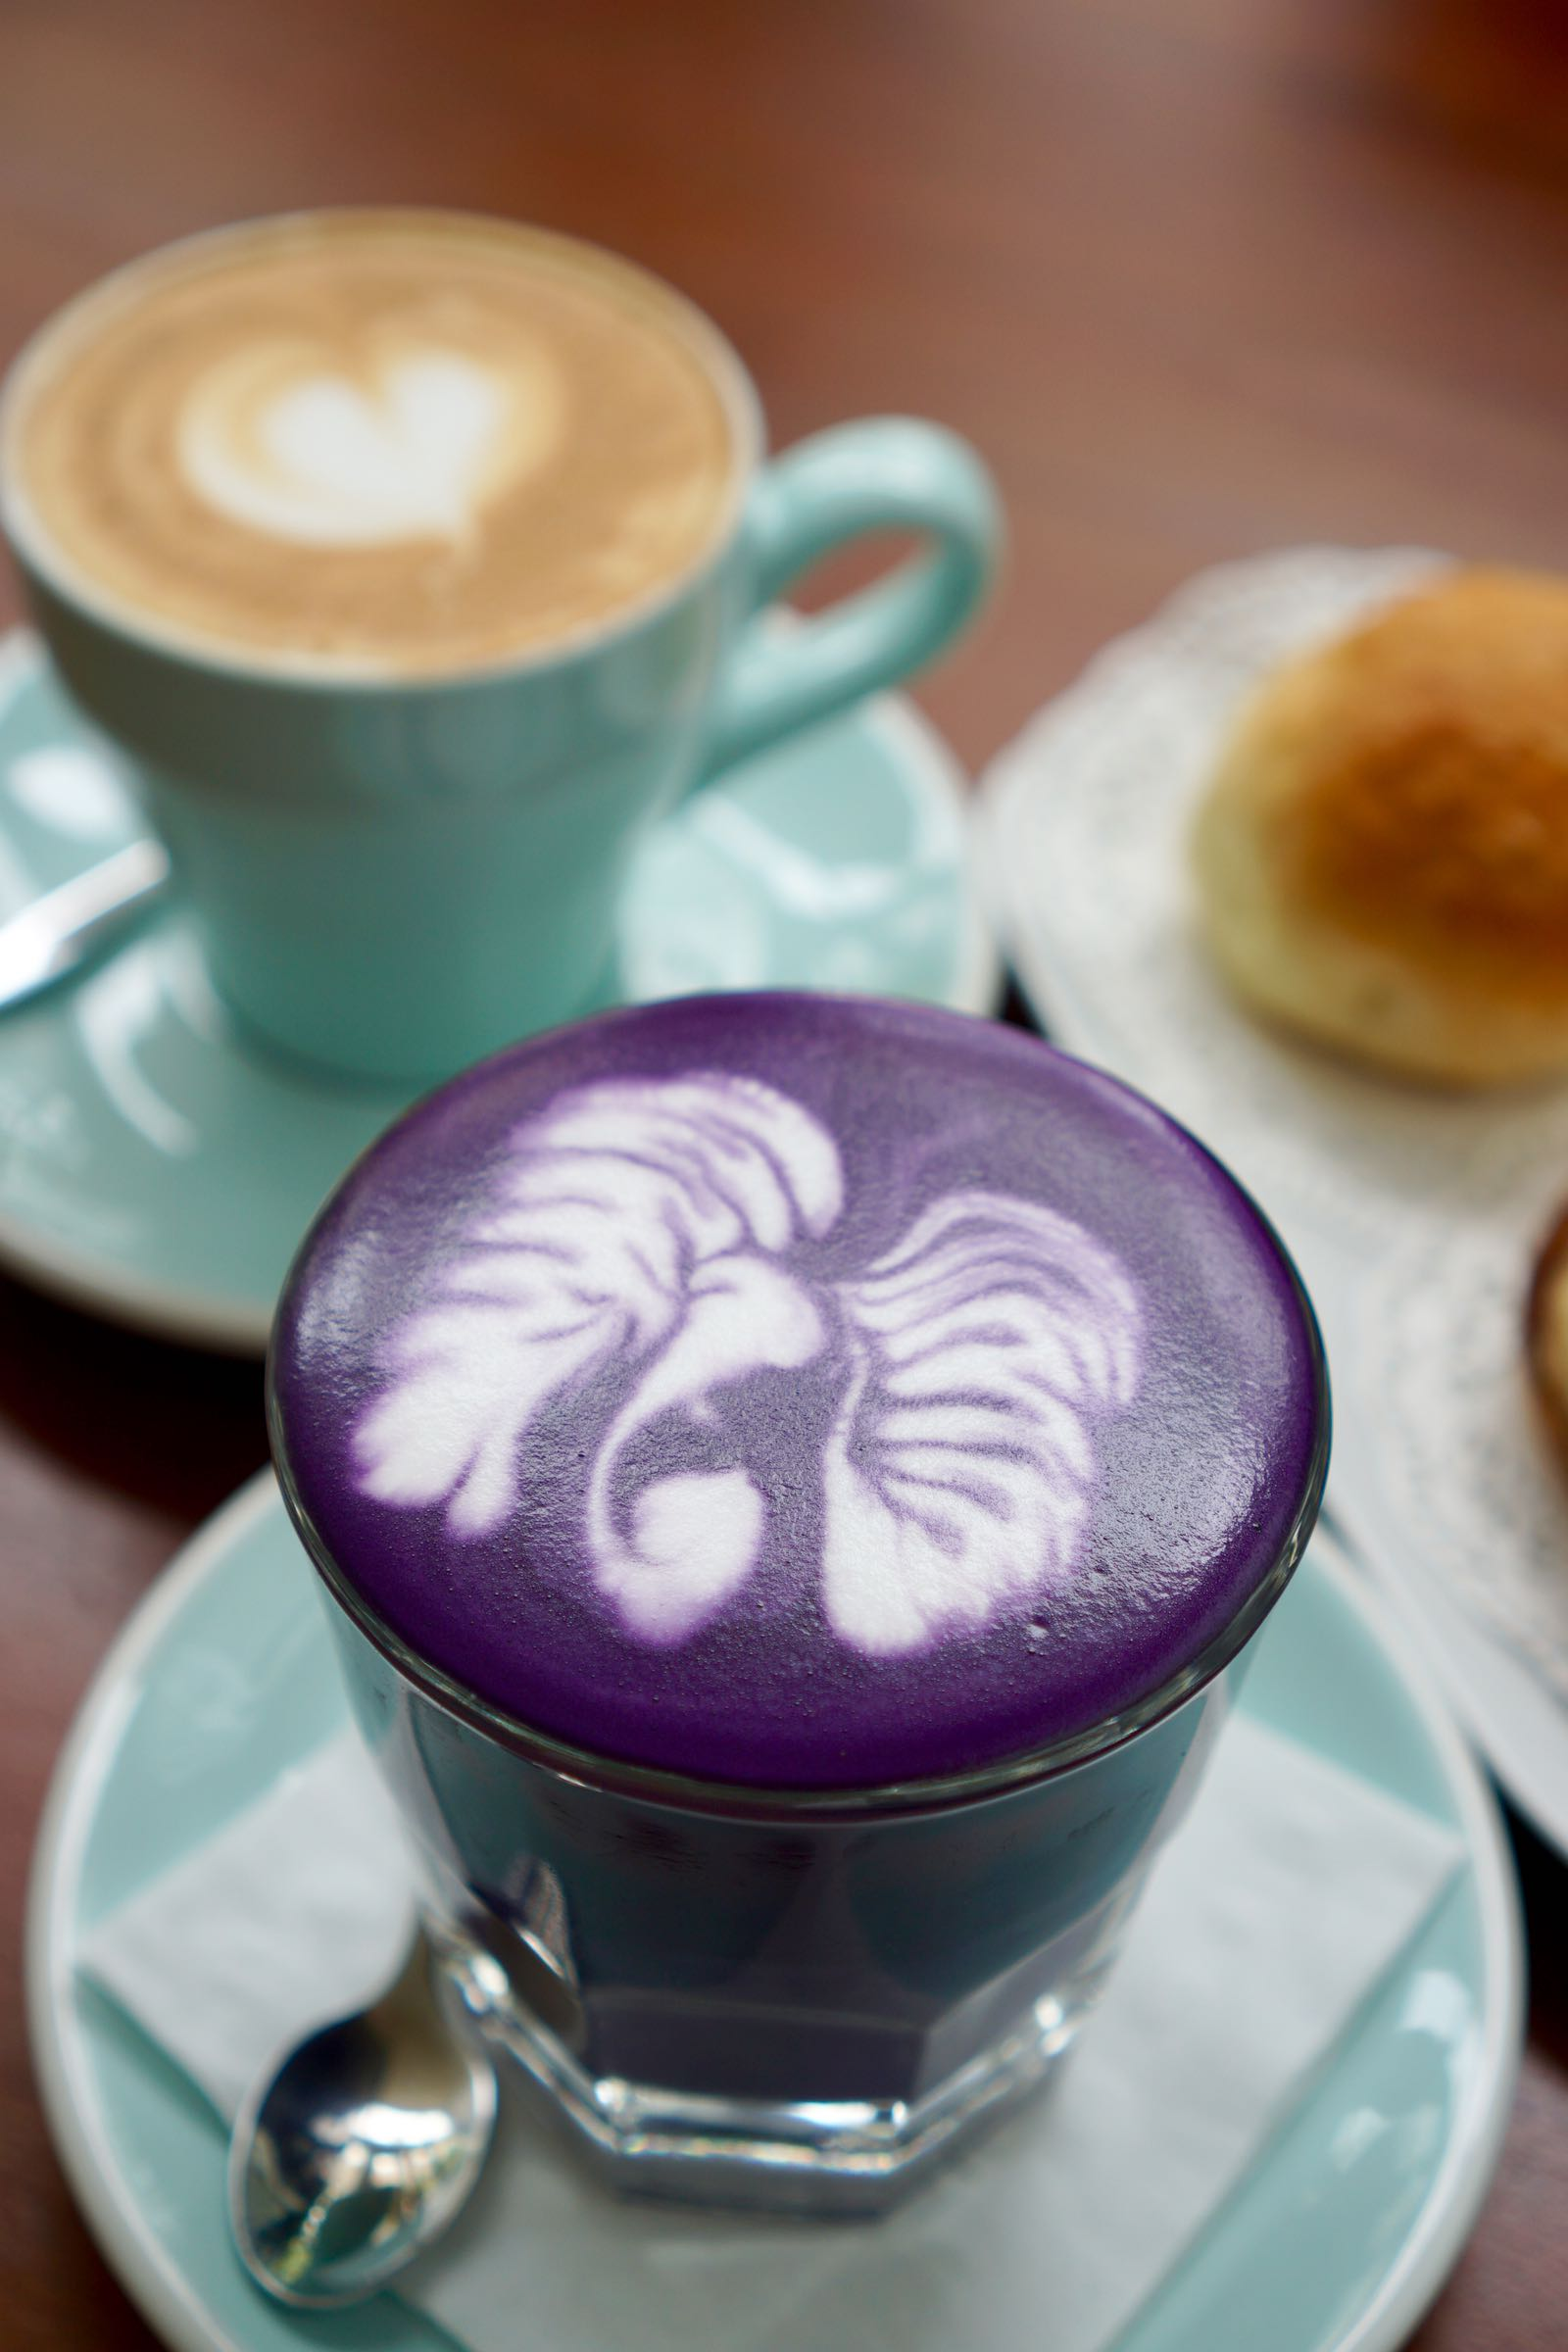 Hot Taro Latte Sydwic